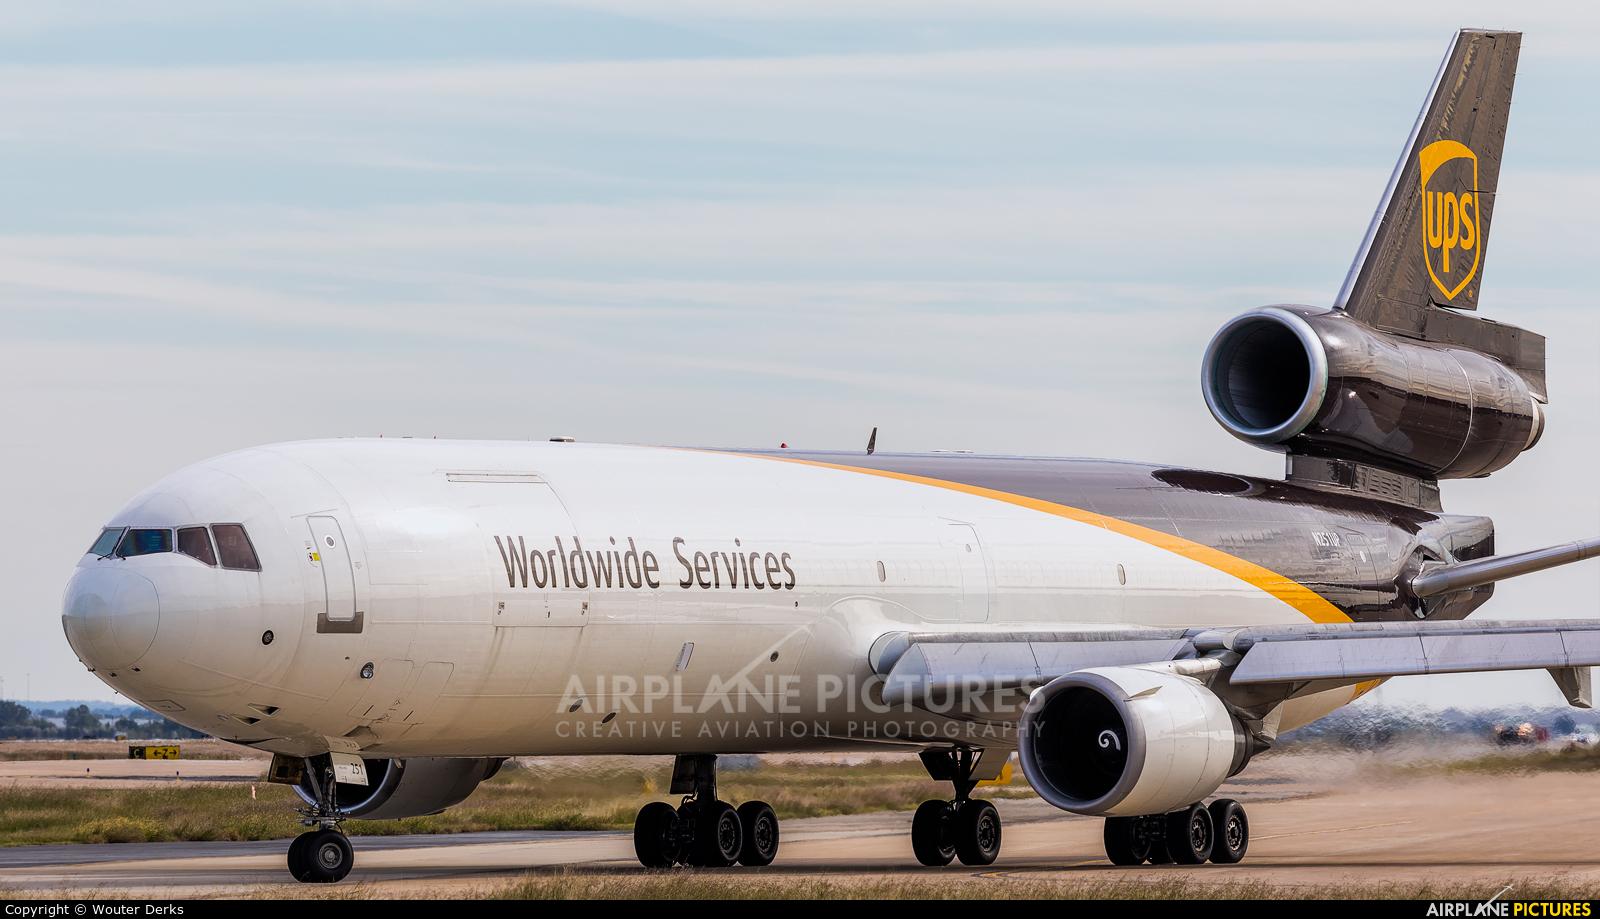 UPS - United Parcel Service N251UP aircraft at Dallas - Fort Worth Intl